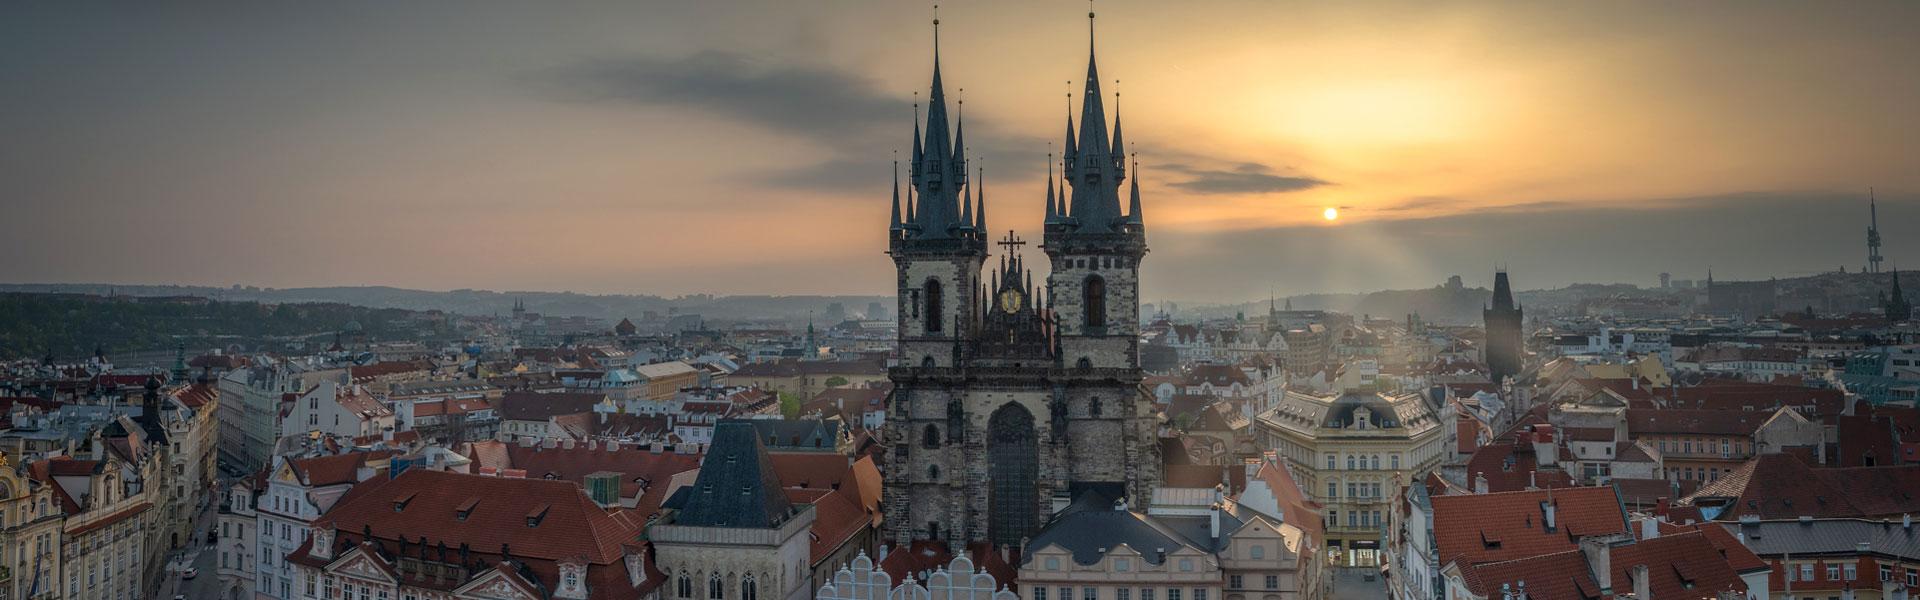 Church Of Our Lady Before Tn Chrm Matky Bo Ped Tnem Prague